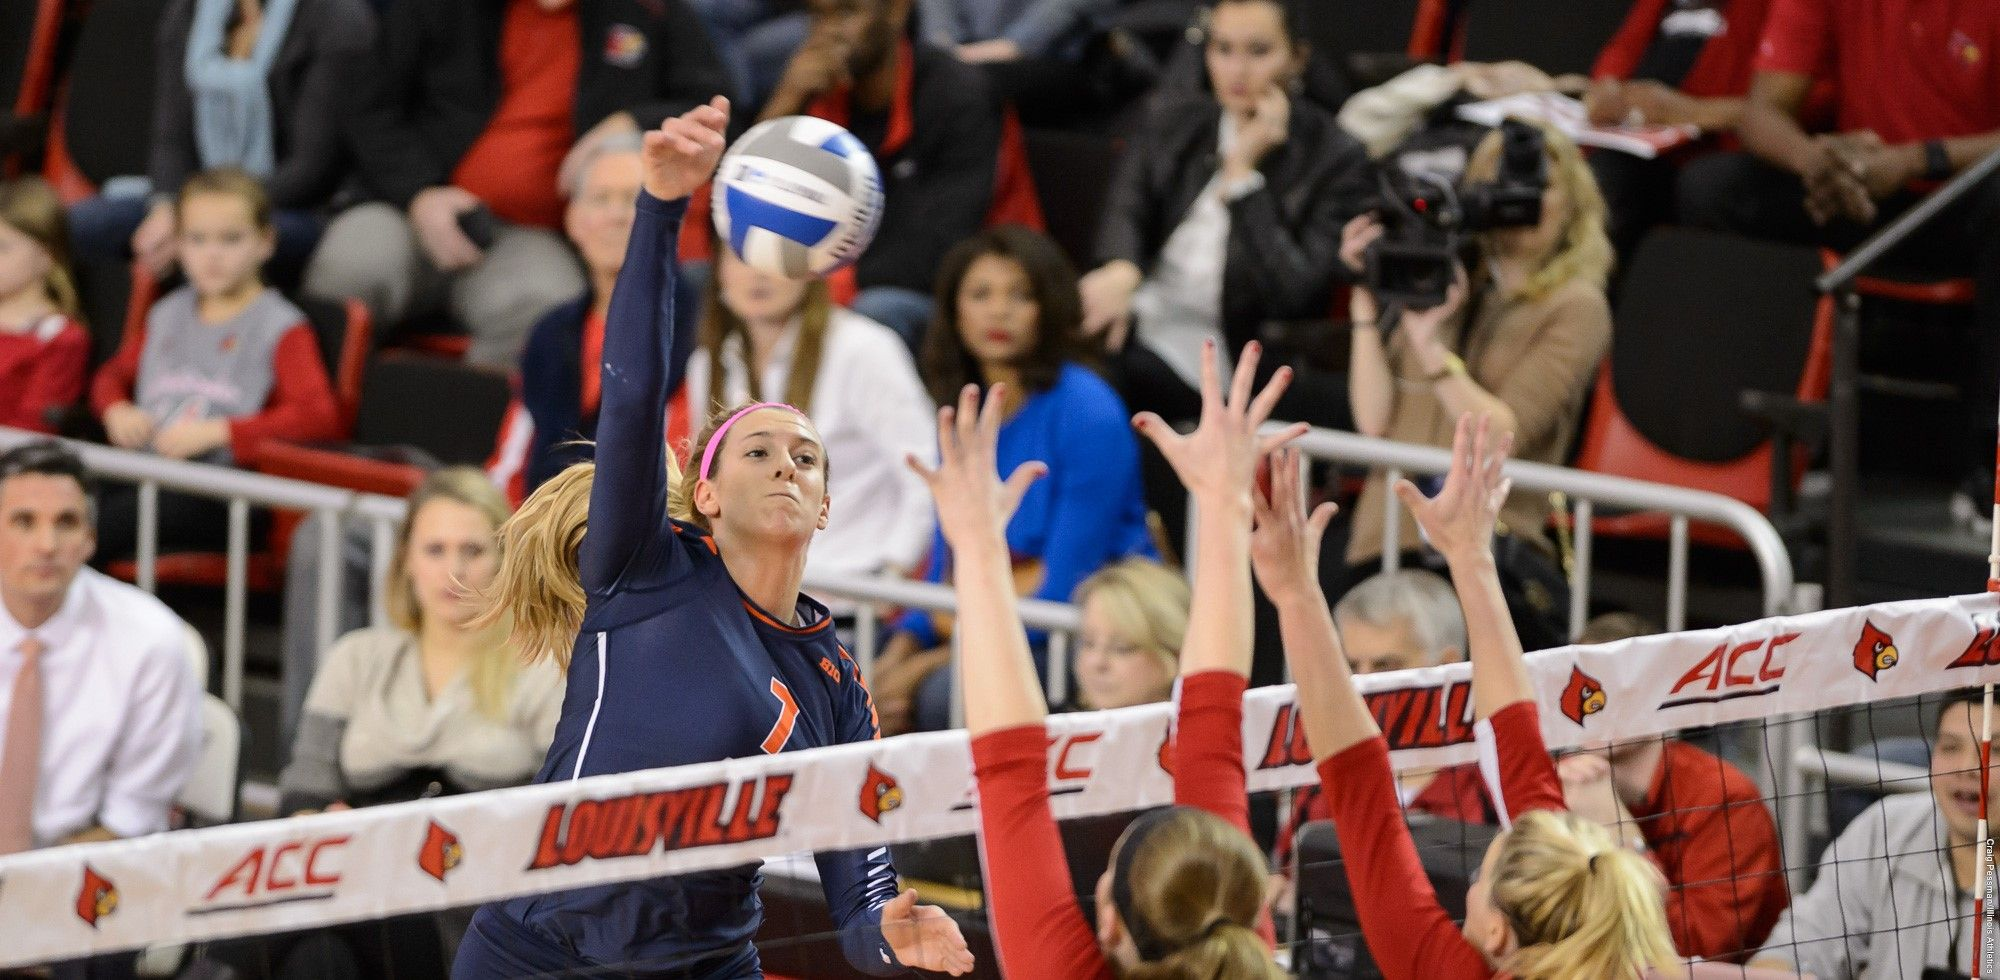 Birks Big Play Sends Illini To Third Straight Sweet 16 University Of Illinois Athletics University Of Illinois Athletics Volleyball News Volleyball Team